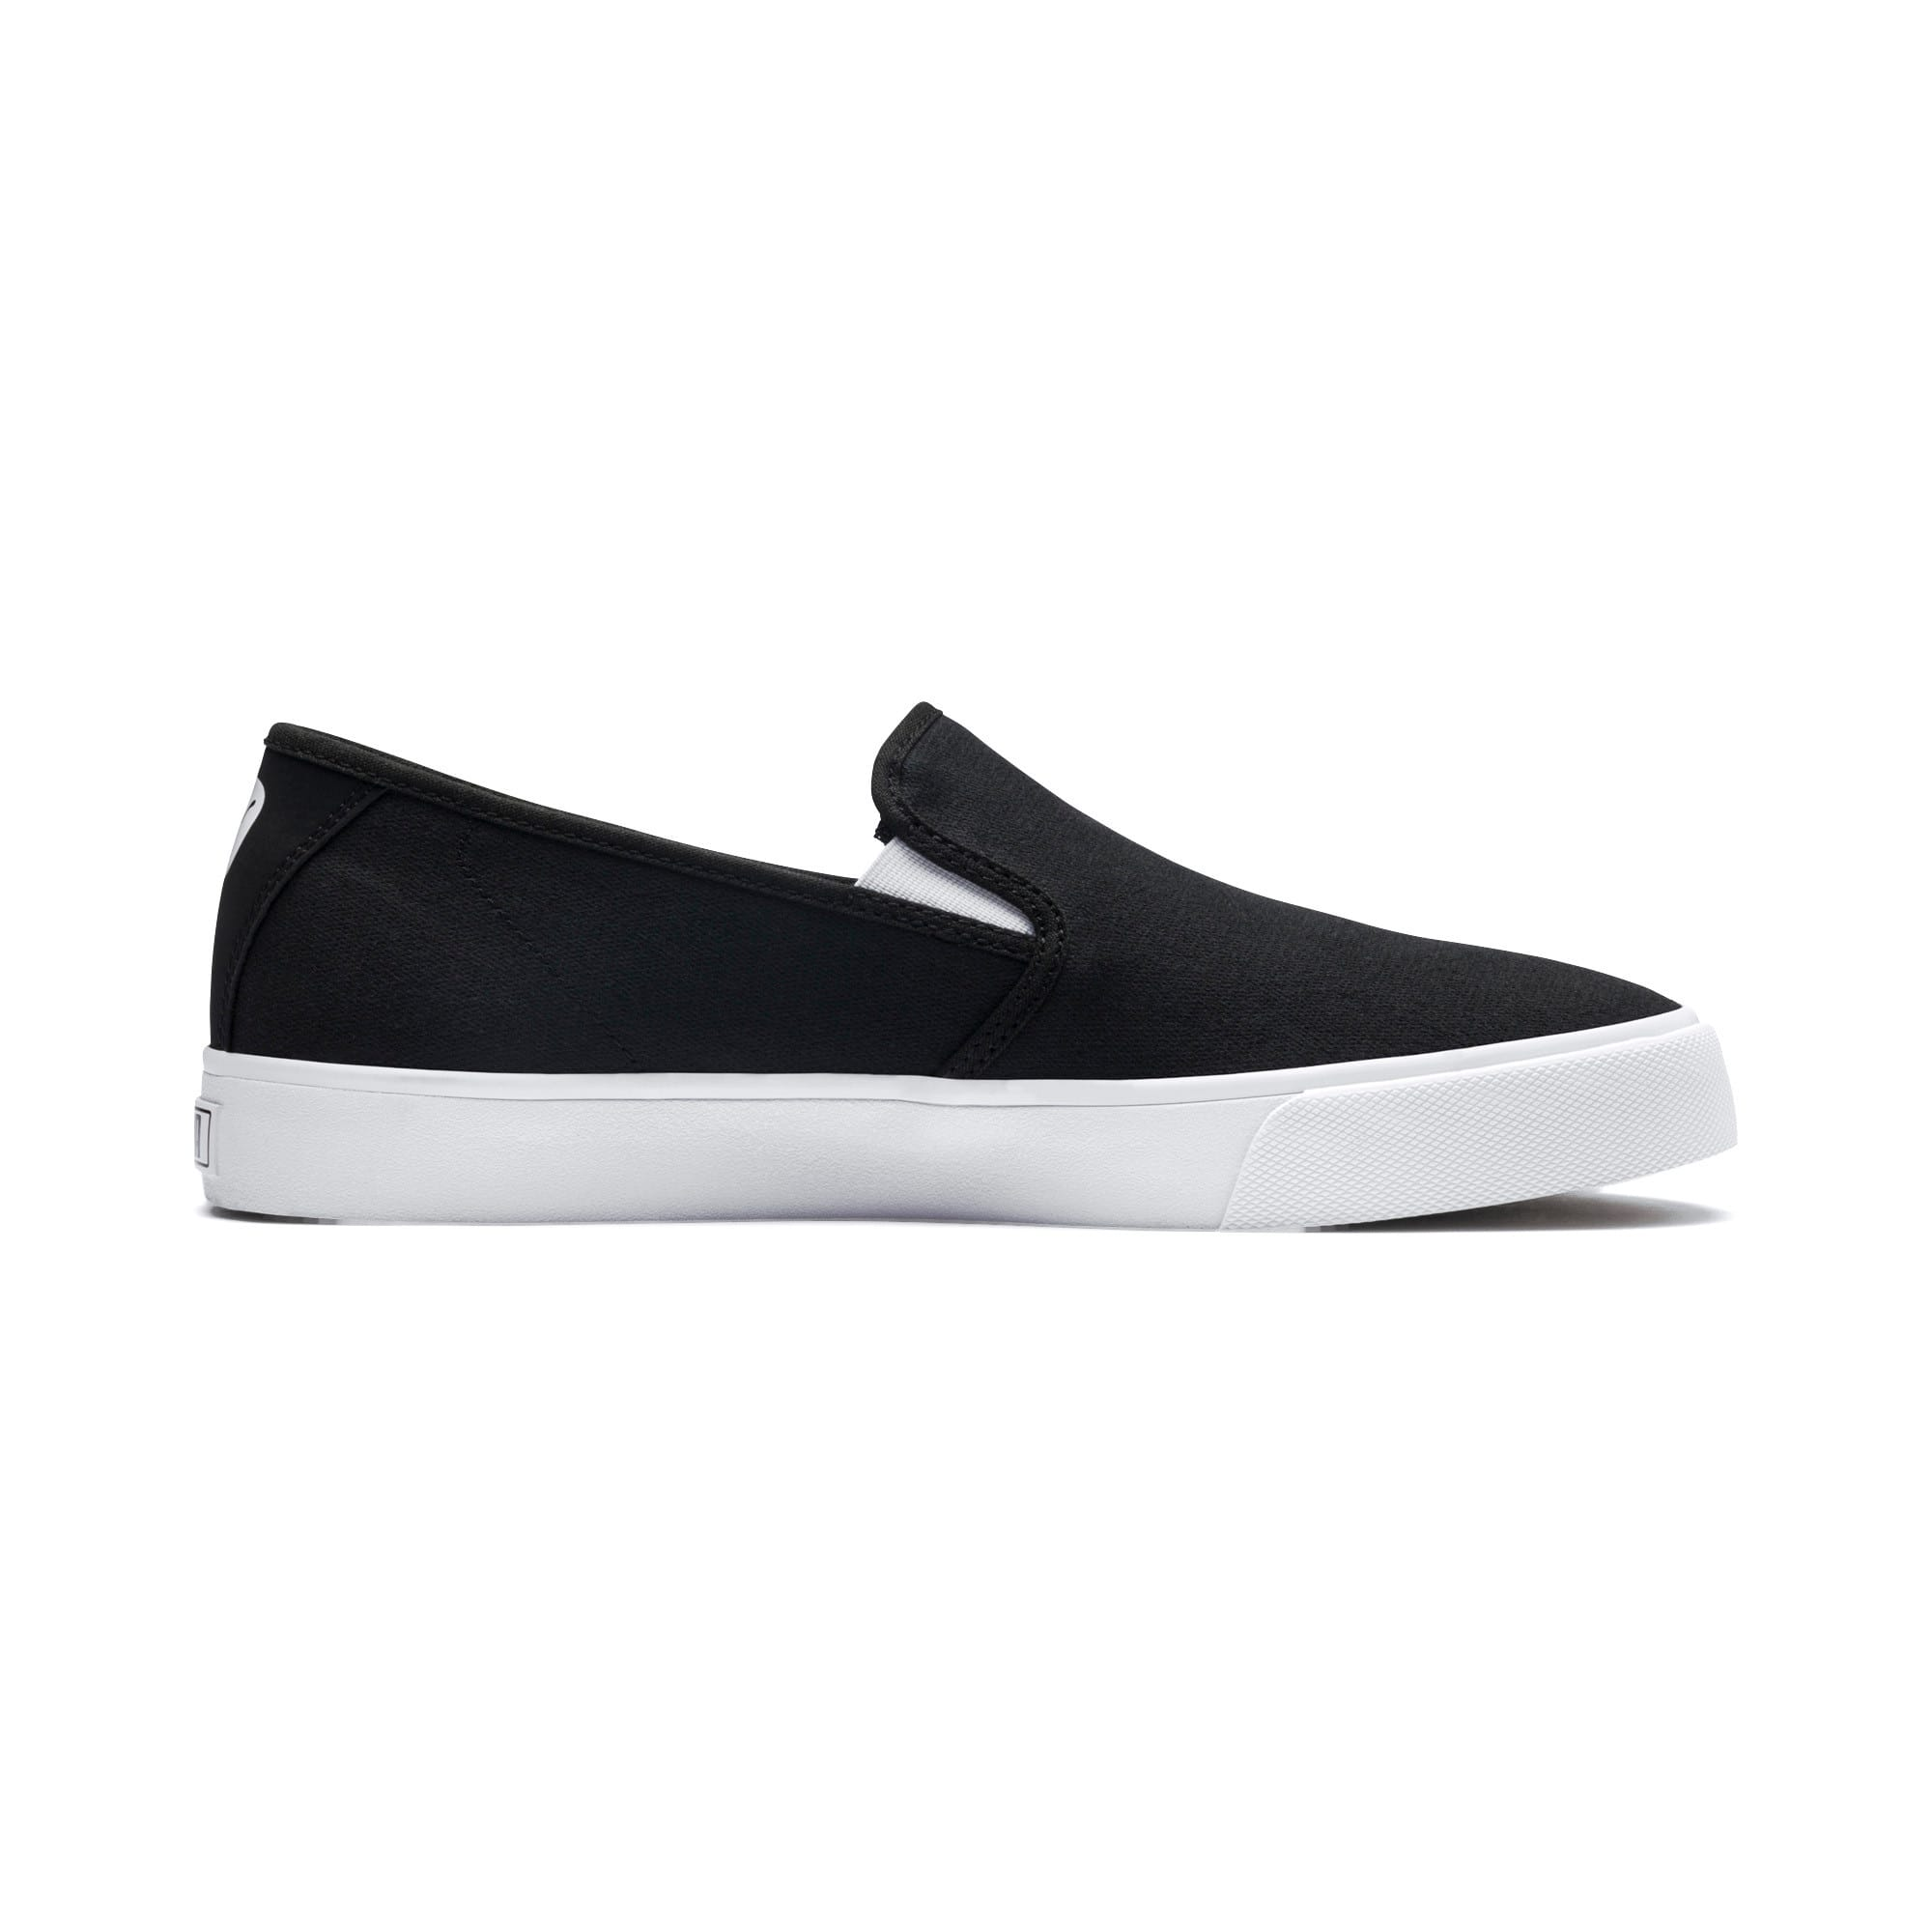 Thumbnail 5 of Bari Slip-On Shoes, Puma Black-Puma White, medium